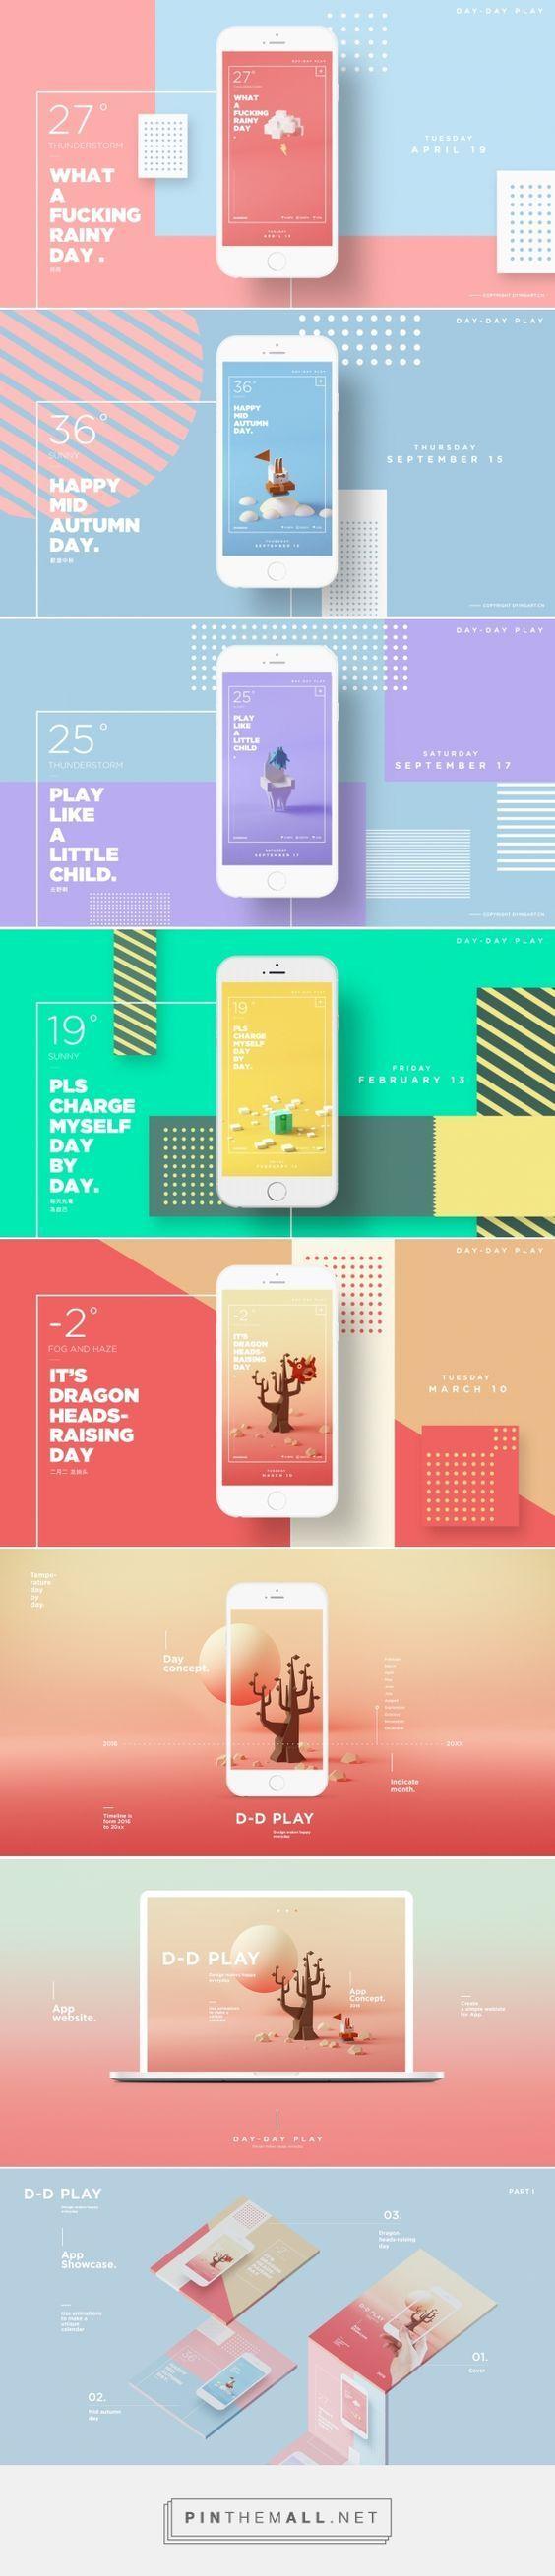 best 25+ presentation layout ideas on pinterest | presentation, Powerpoint templates